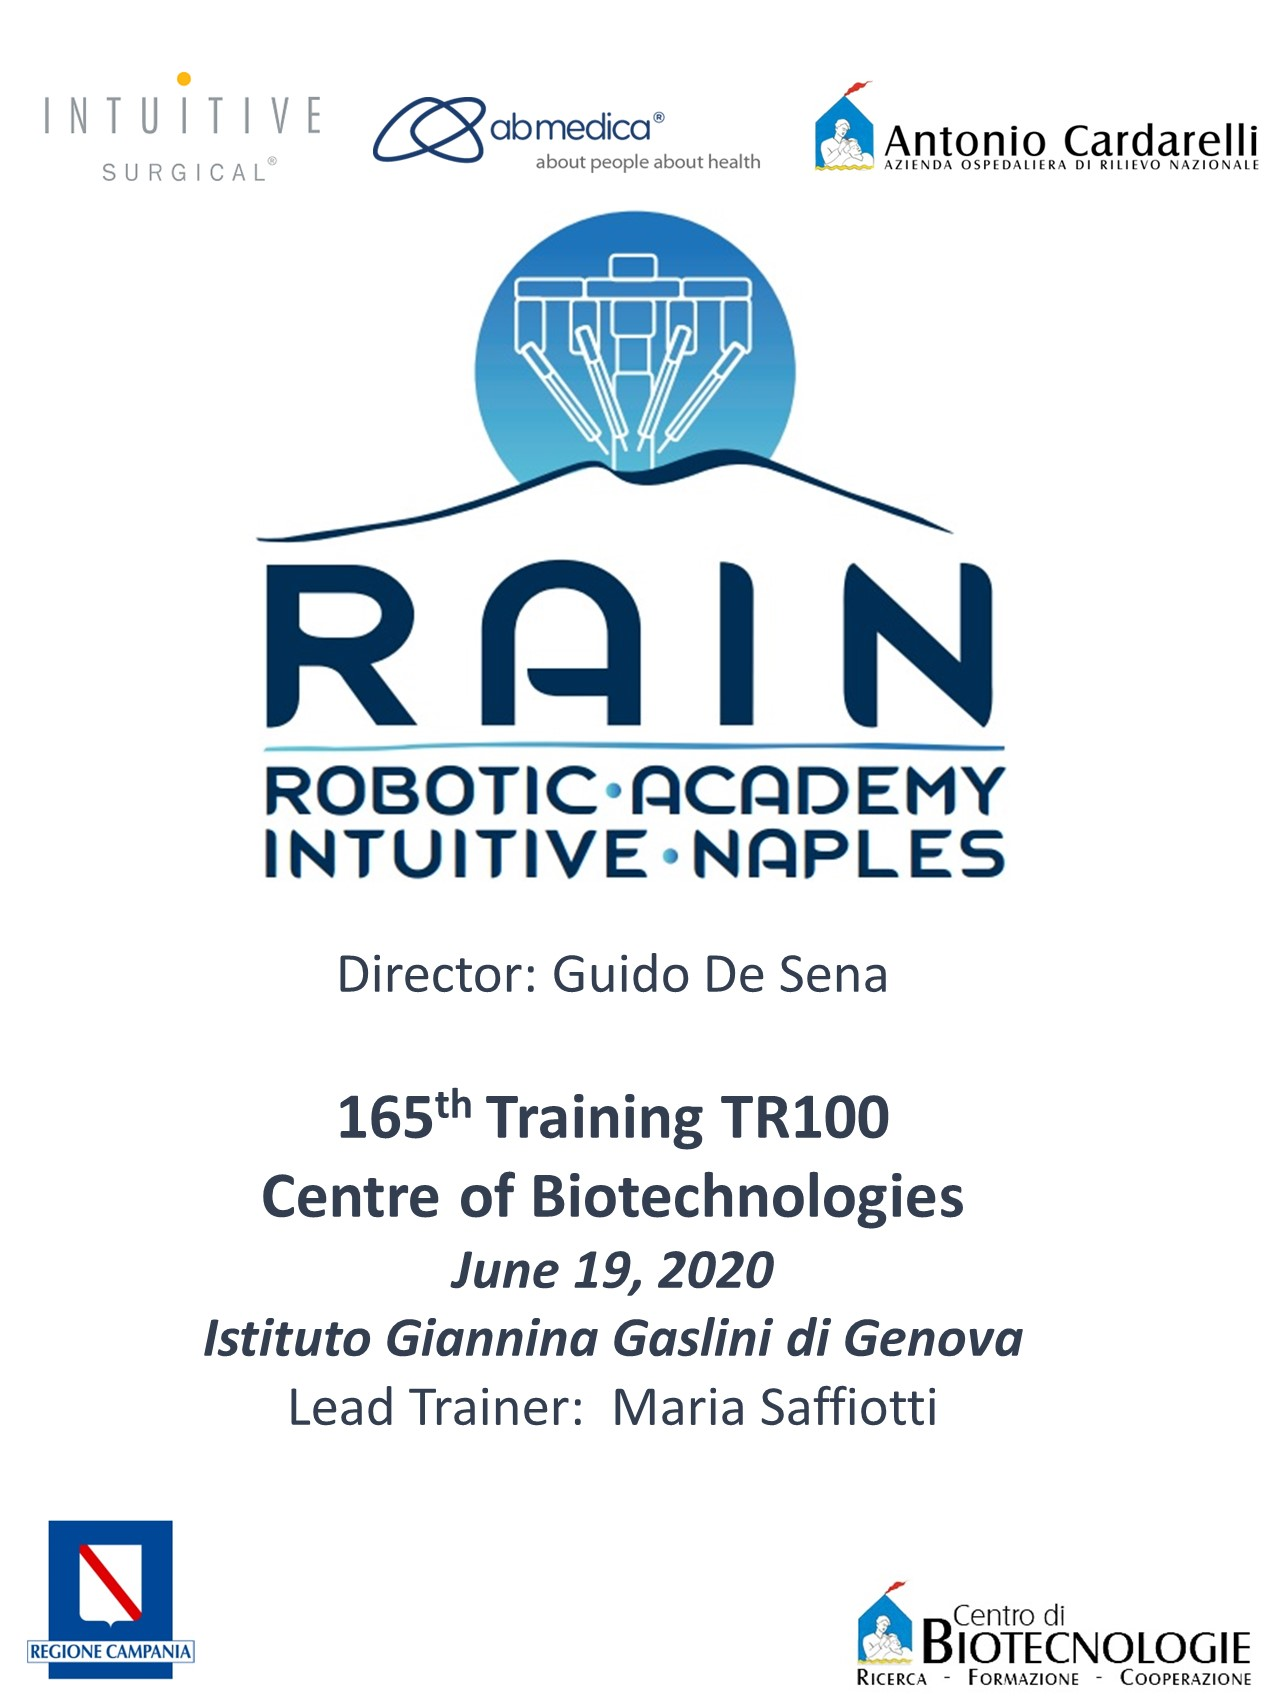 RAIN - Robotic Academy Intuitive Naples - 165th Training TR100